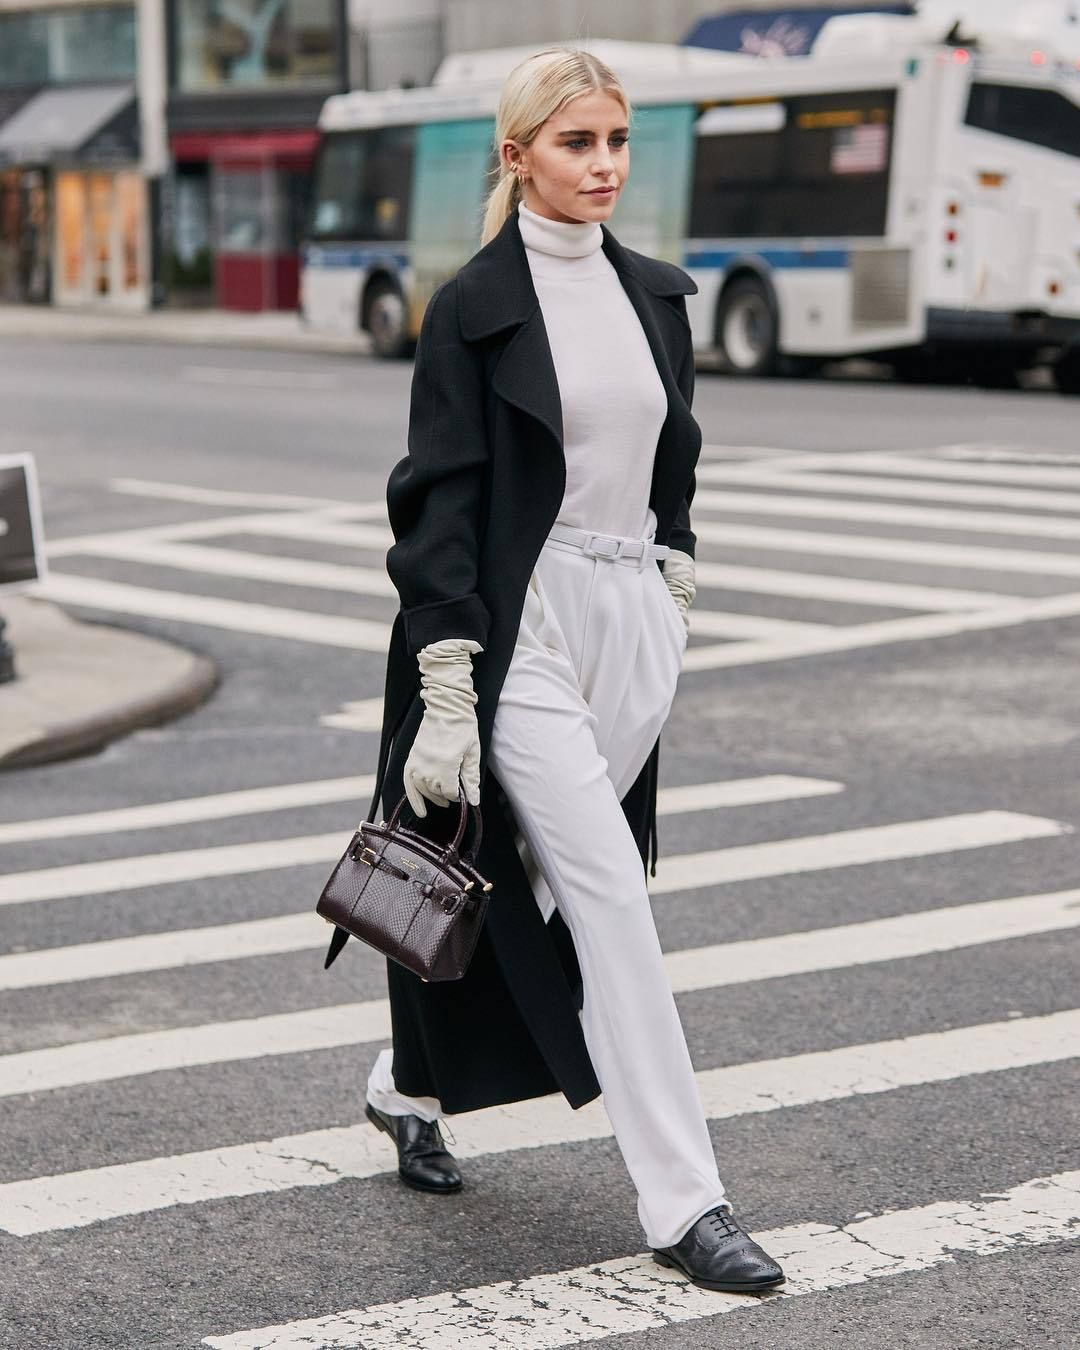 coat black coat long coat oversized coat ralph lauren black shoes white pants pleated high waisted pants handbag gloves white turtleneck top